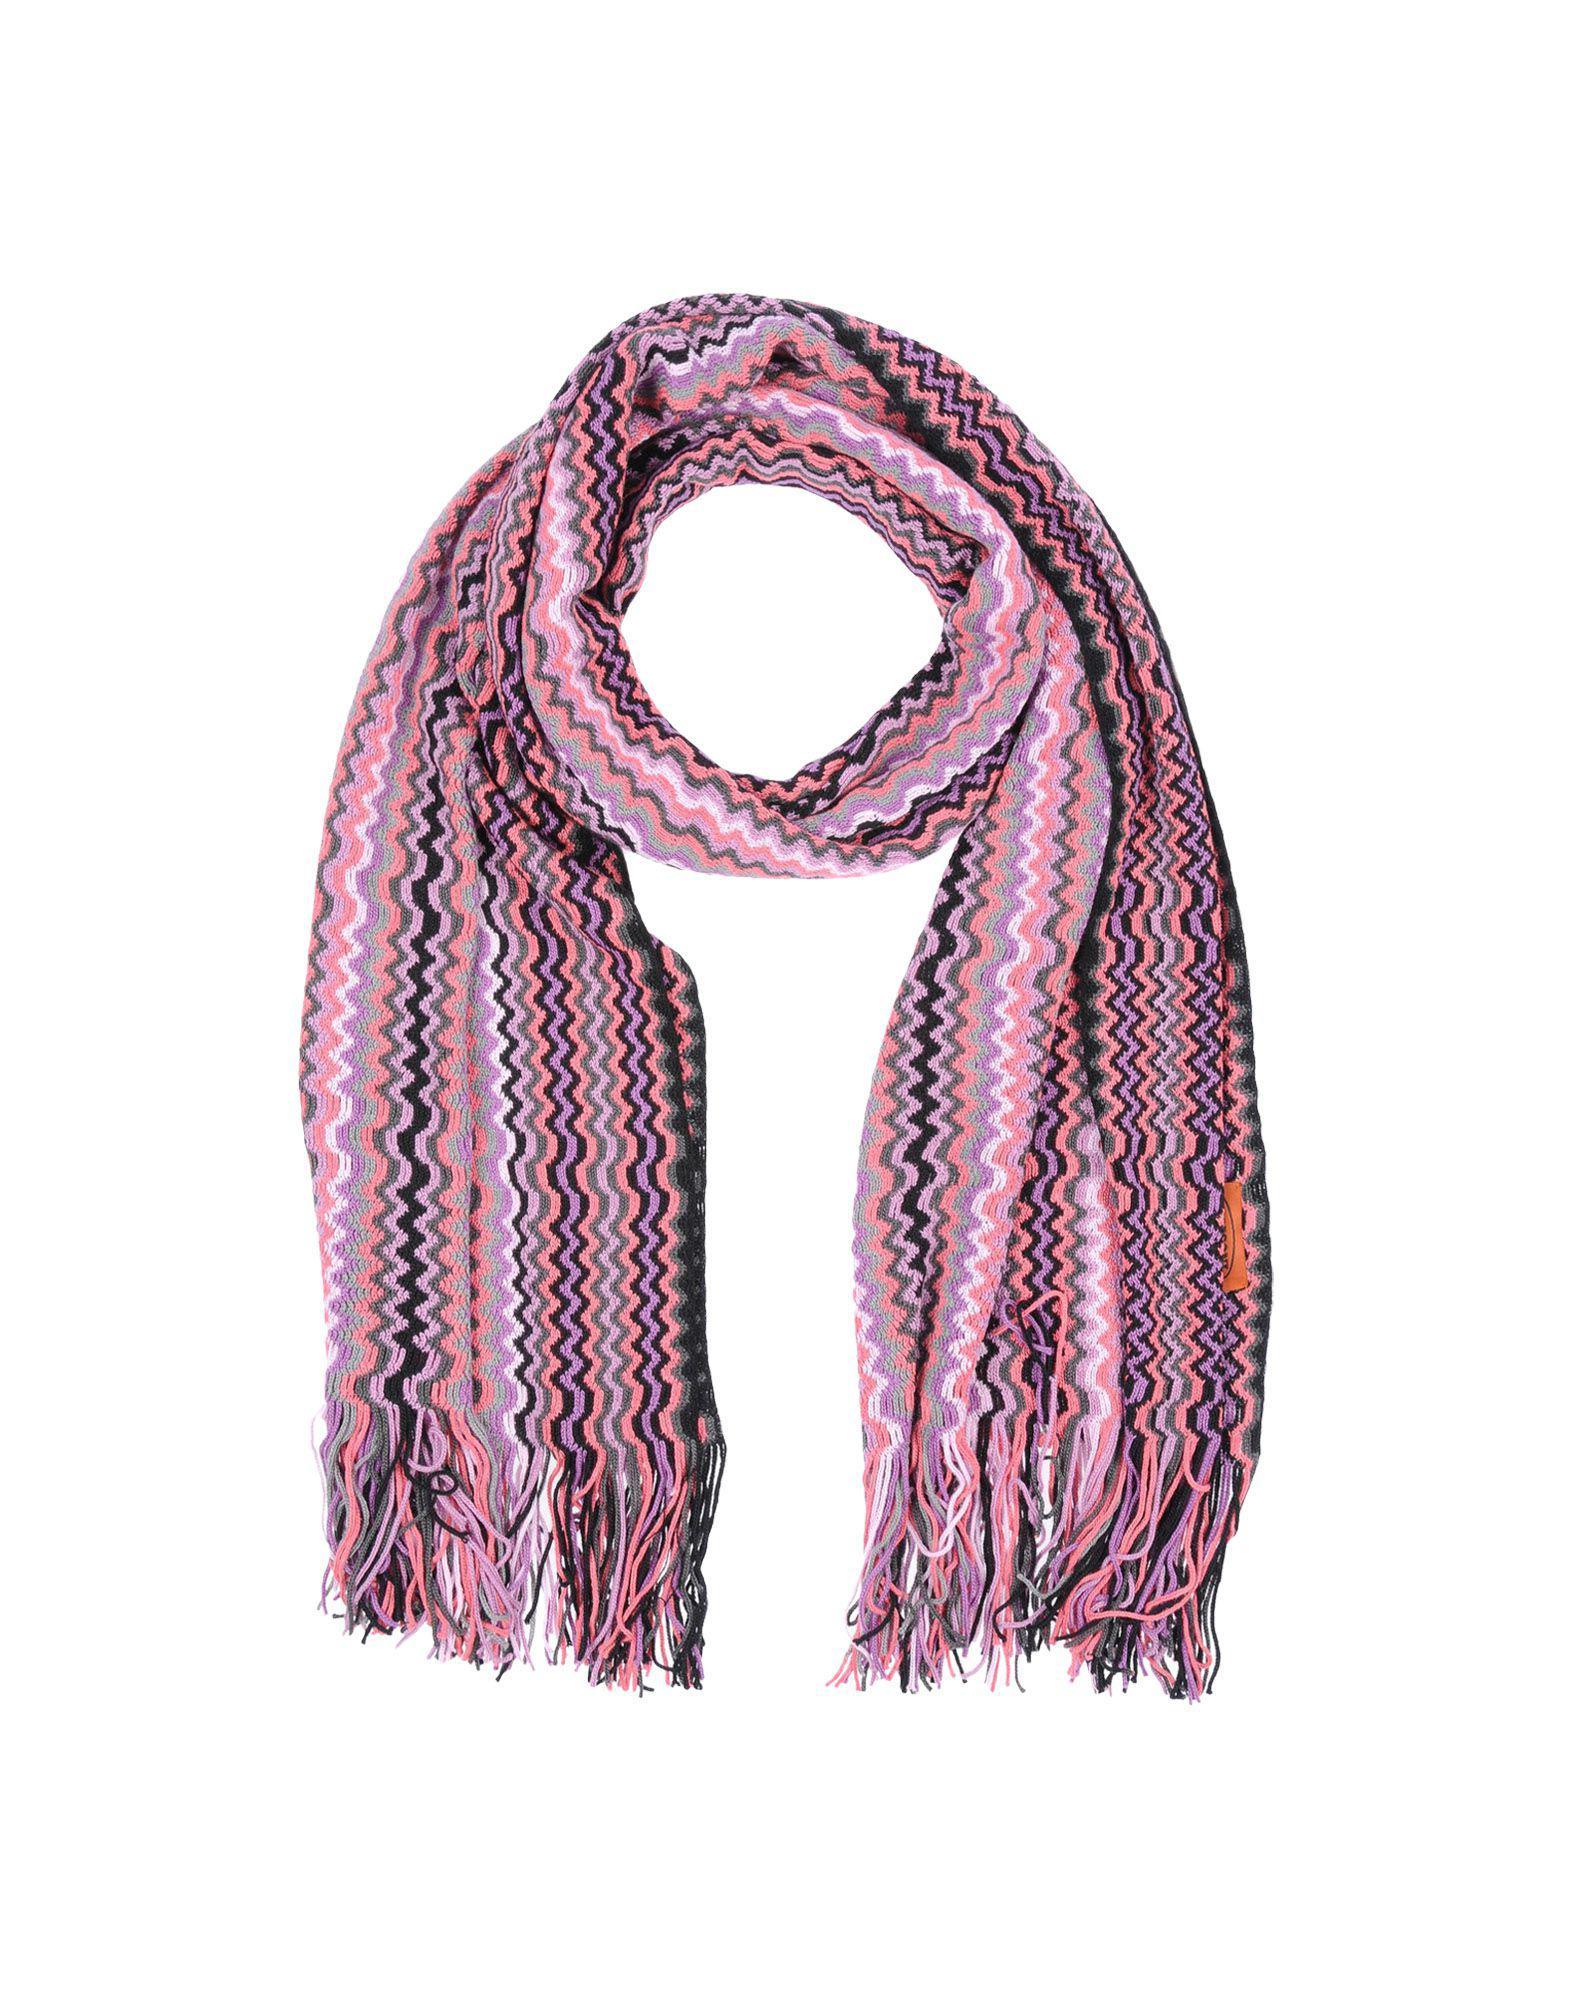 ACCESSORIES - Oblong scarves Missoni M2TvaHcW